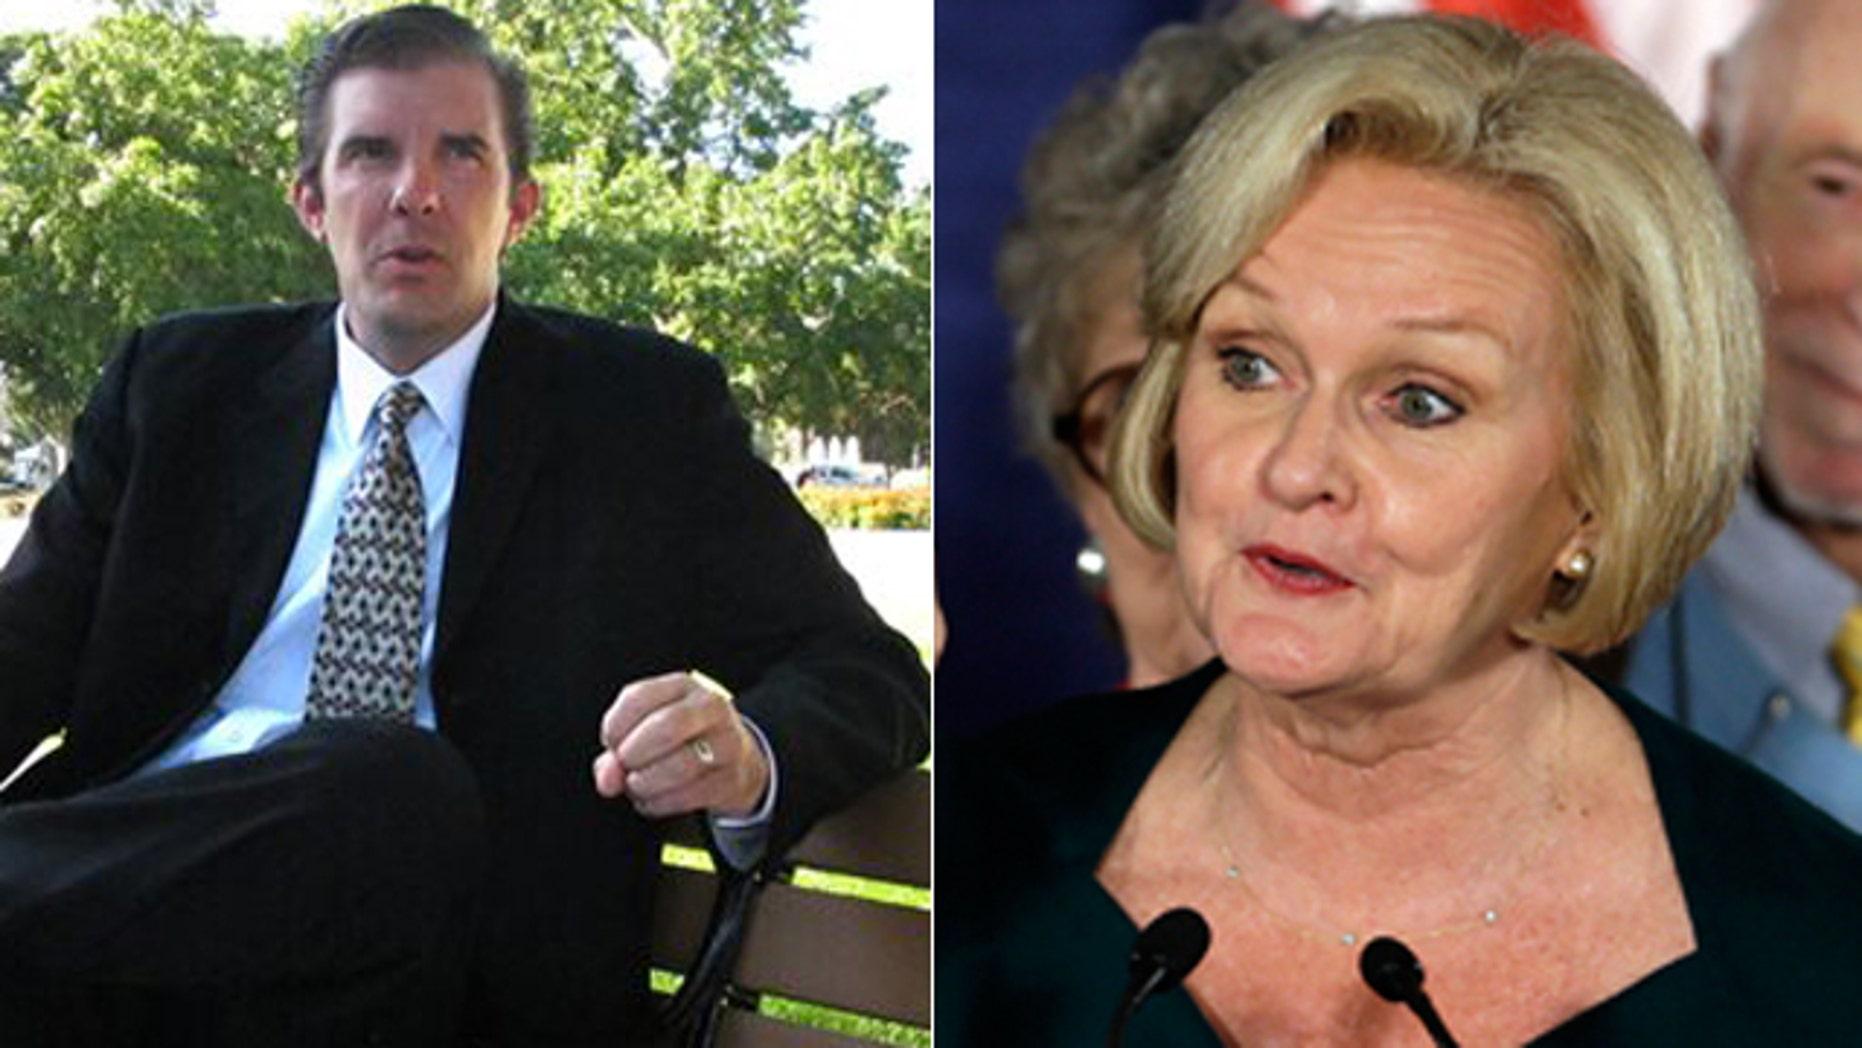 Chad Taylor, left, and Democratic Sen. Claire McCaskill.